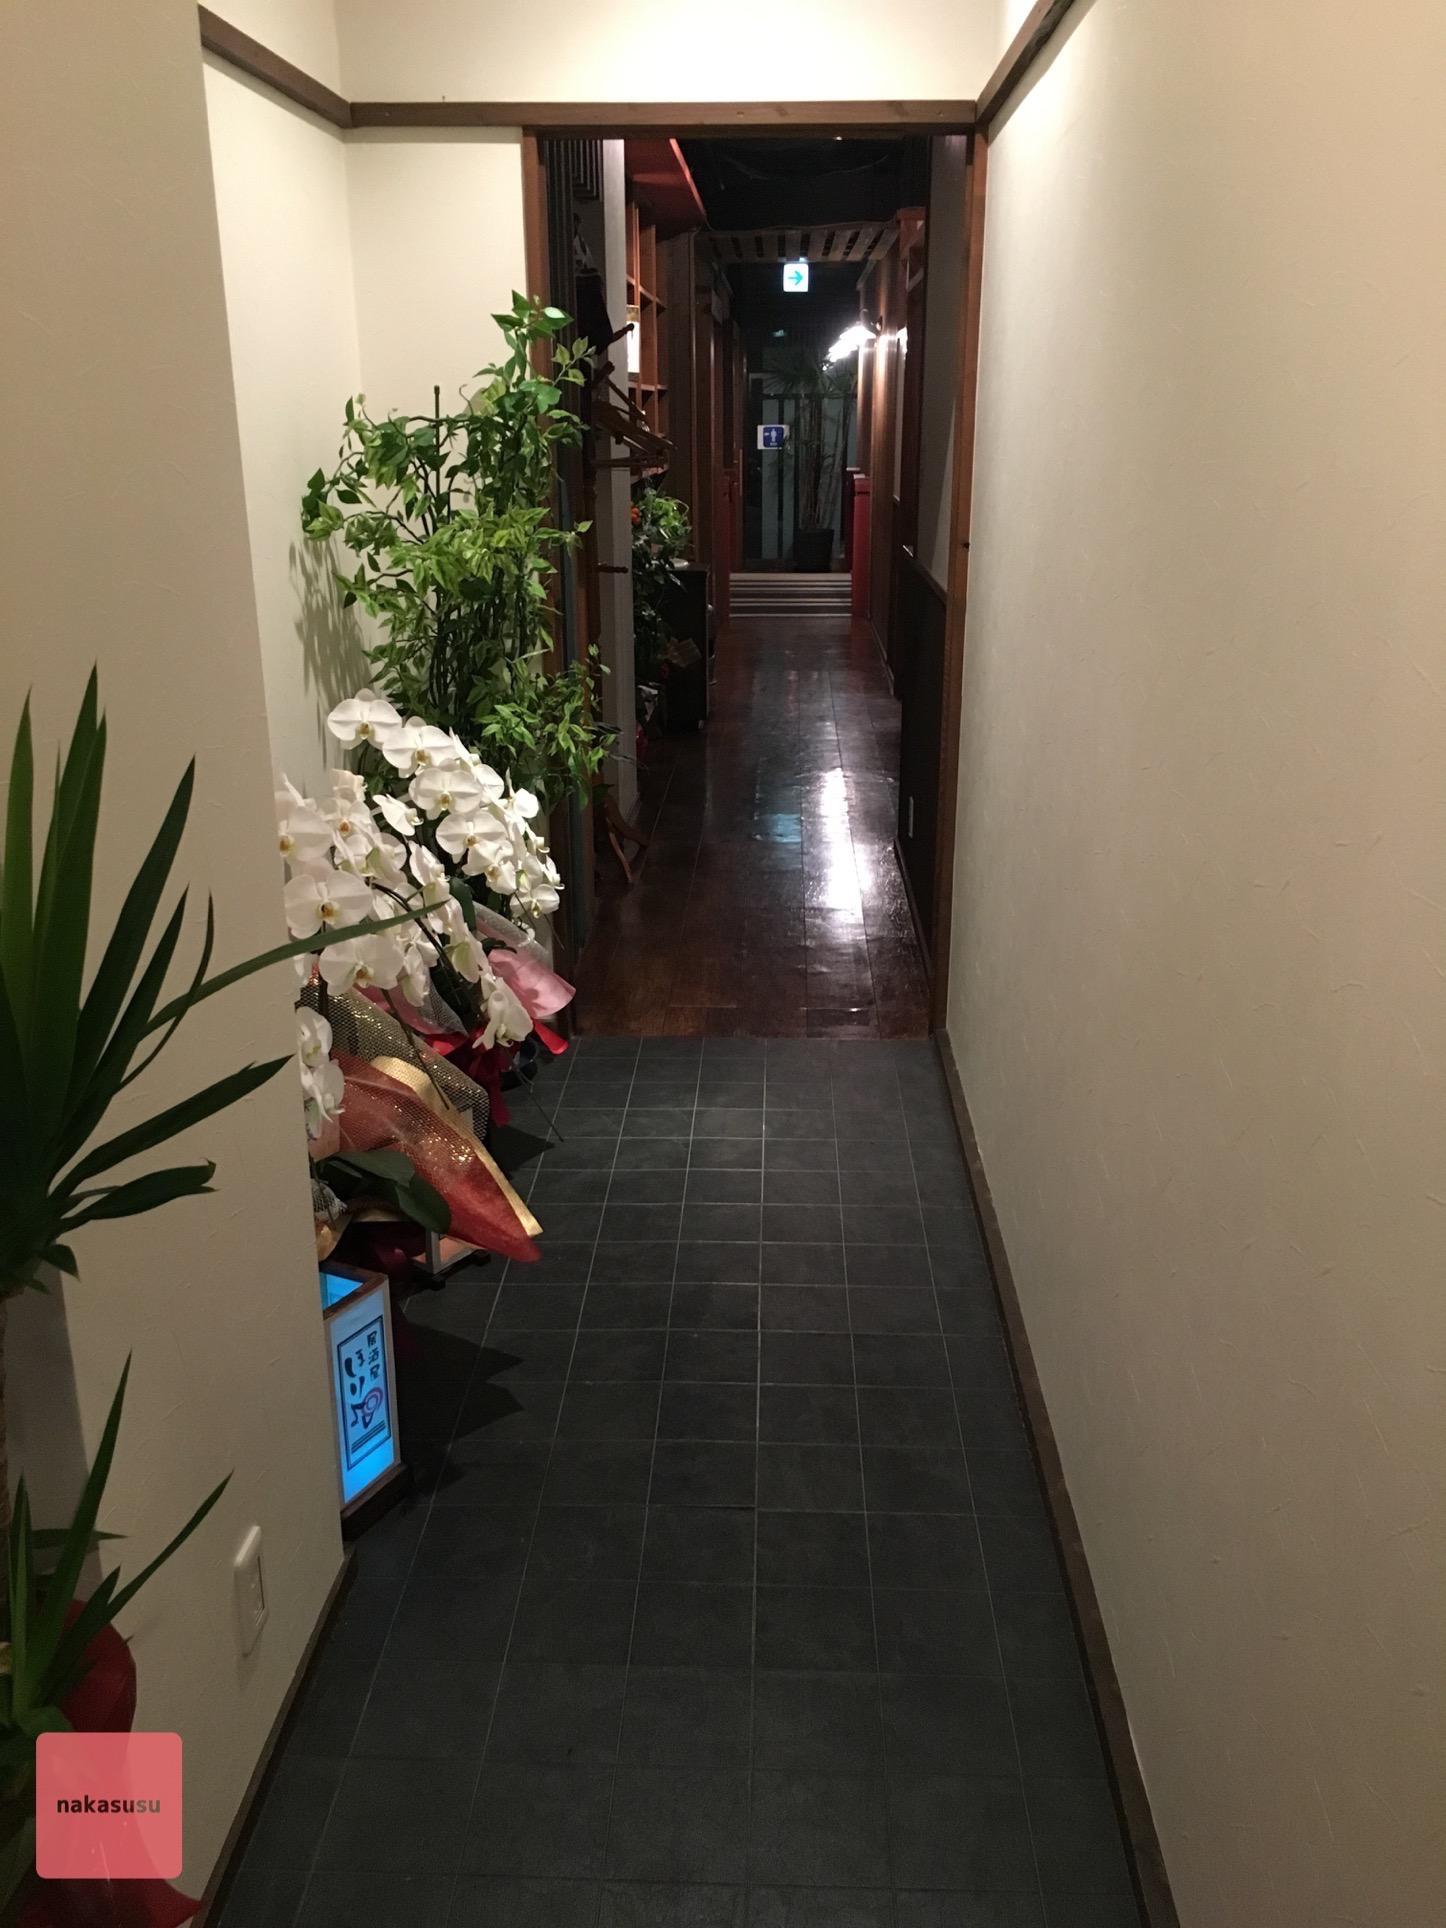 nakasusu.horiyoshi024